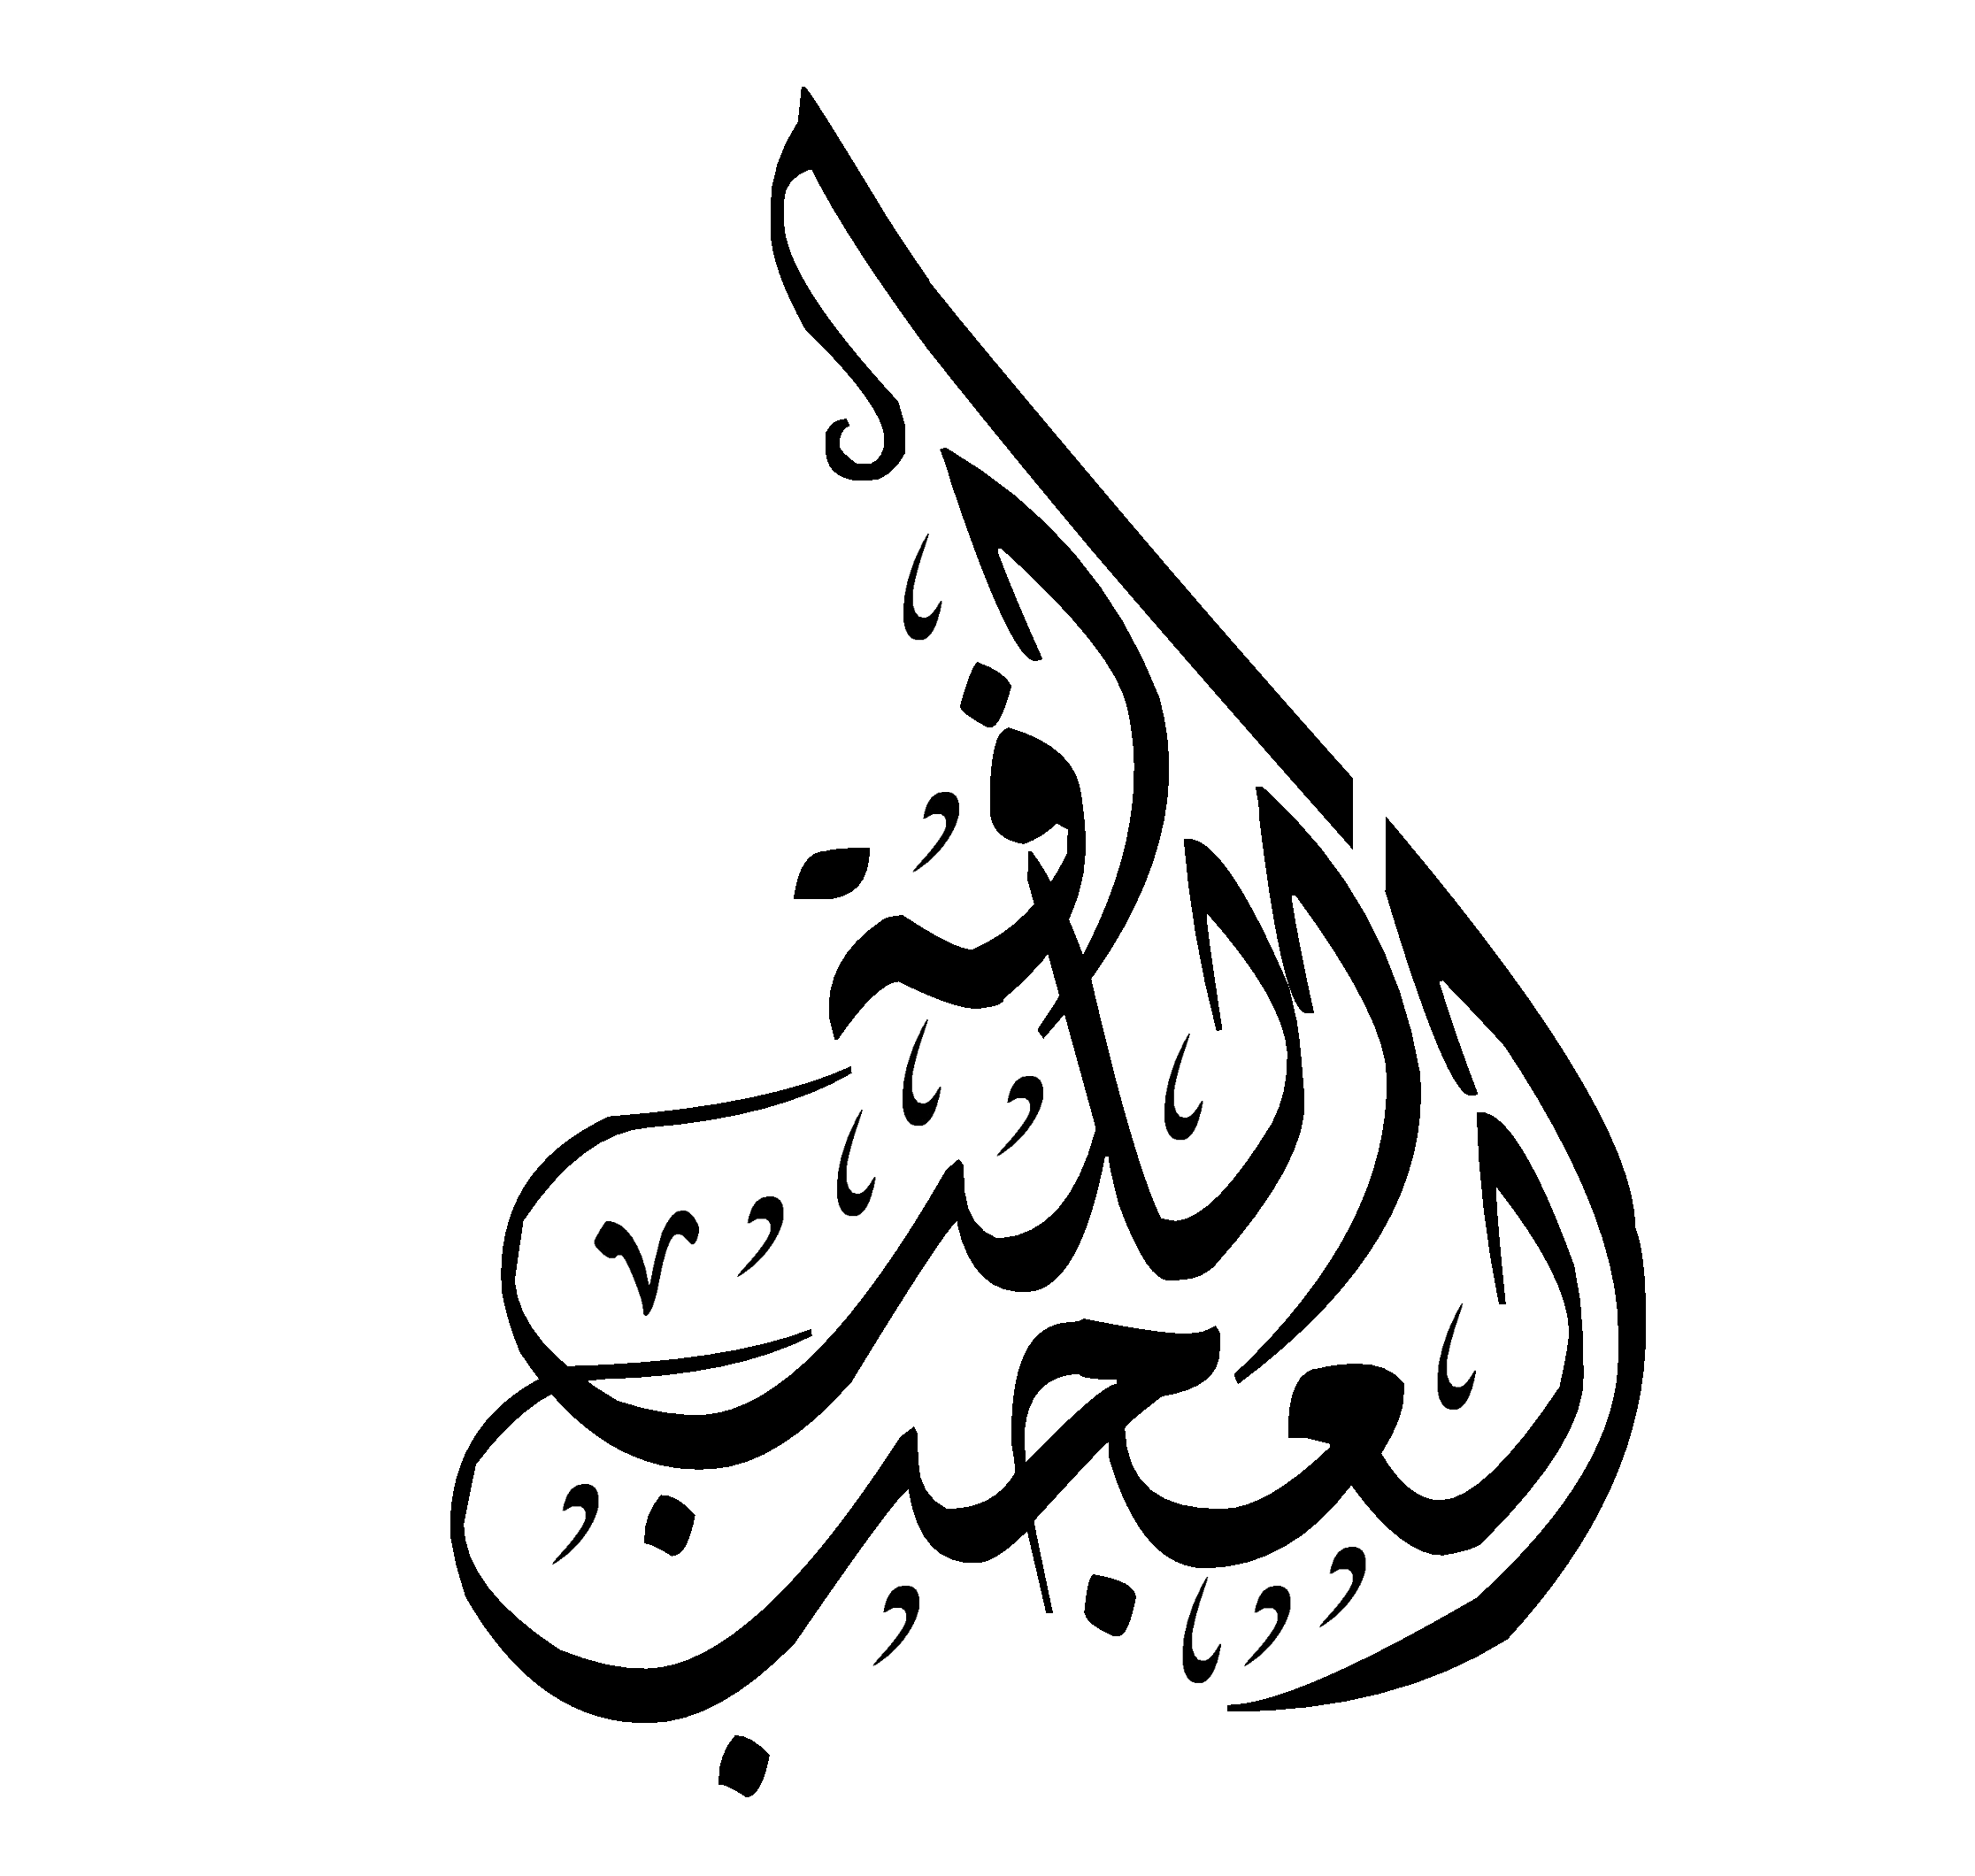 Pin By بسم الله الرحمن الرحيم On مخطوطات حسينية Calligraphy Arabic Calligraphy Art